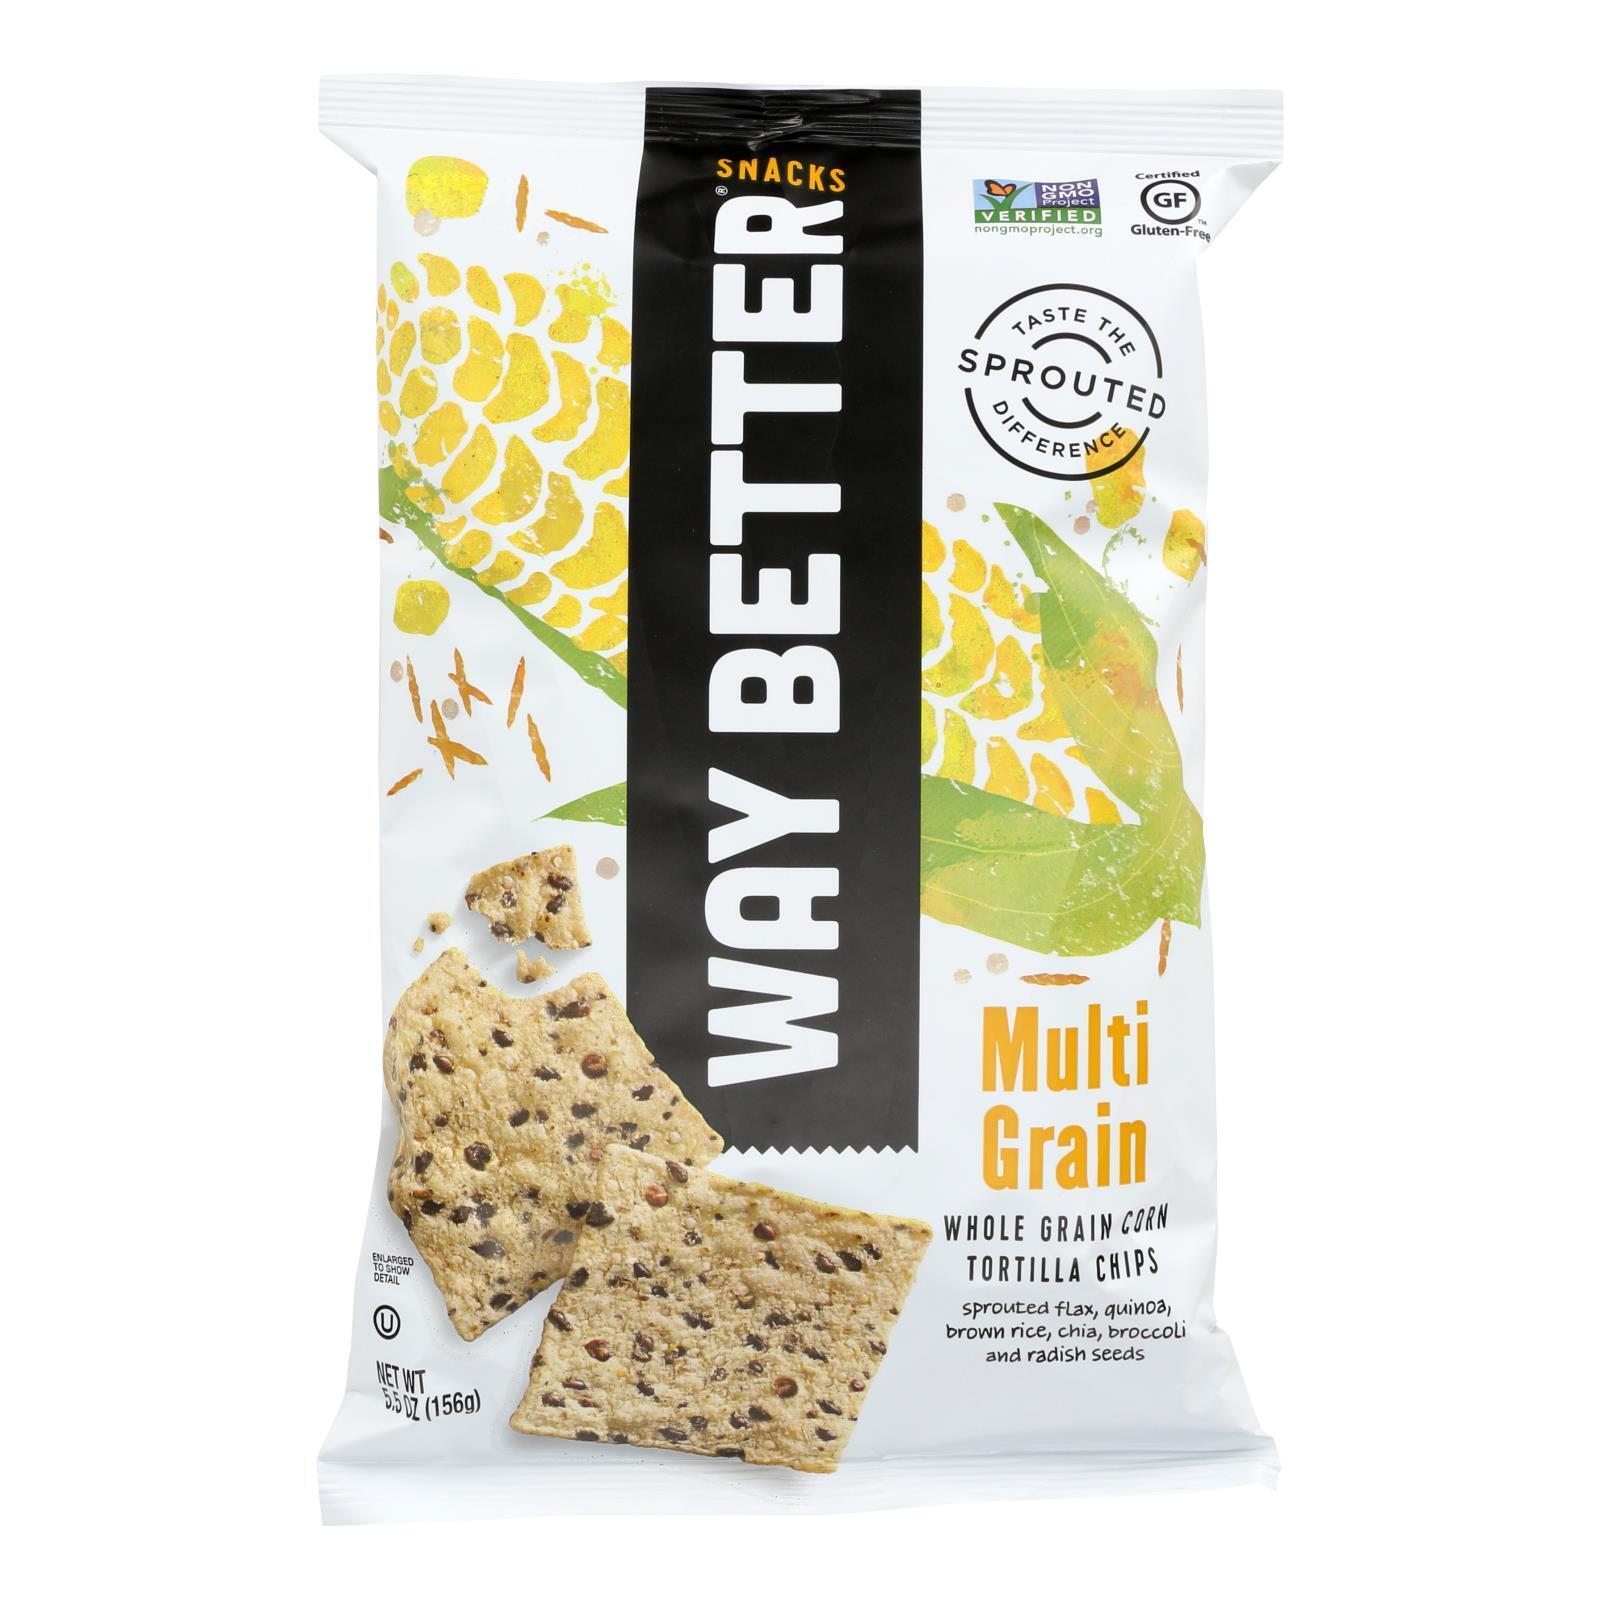 Way Better Snacks Tortilla Chips - Multi - Grain - Case of 12 - 5.5 oz.